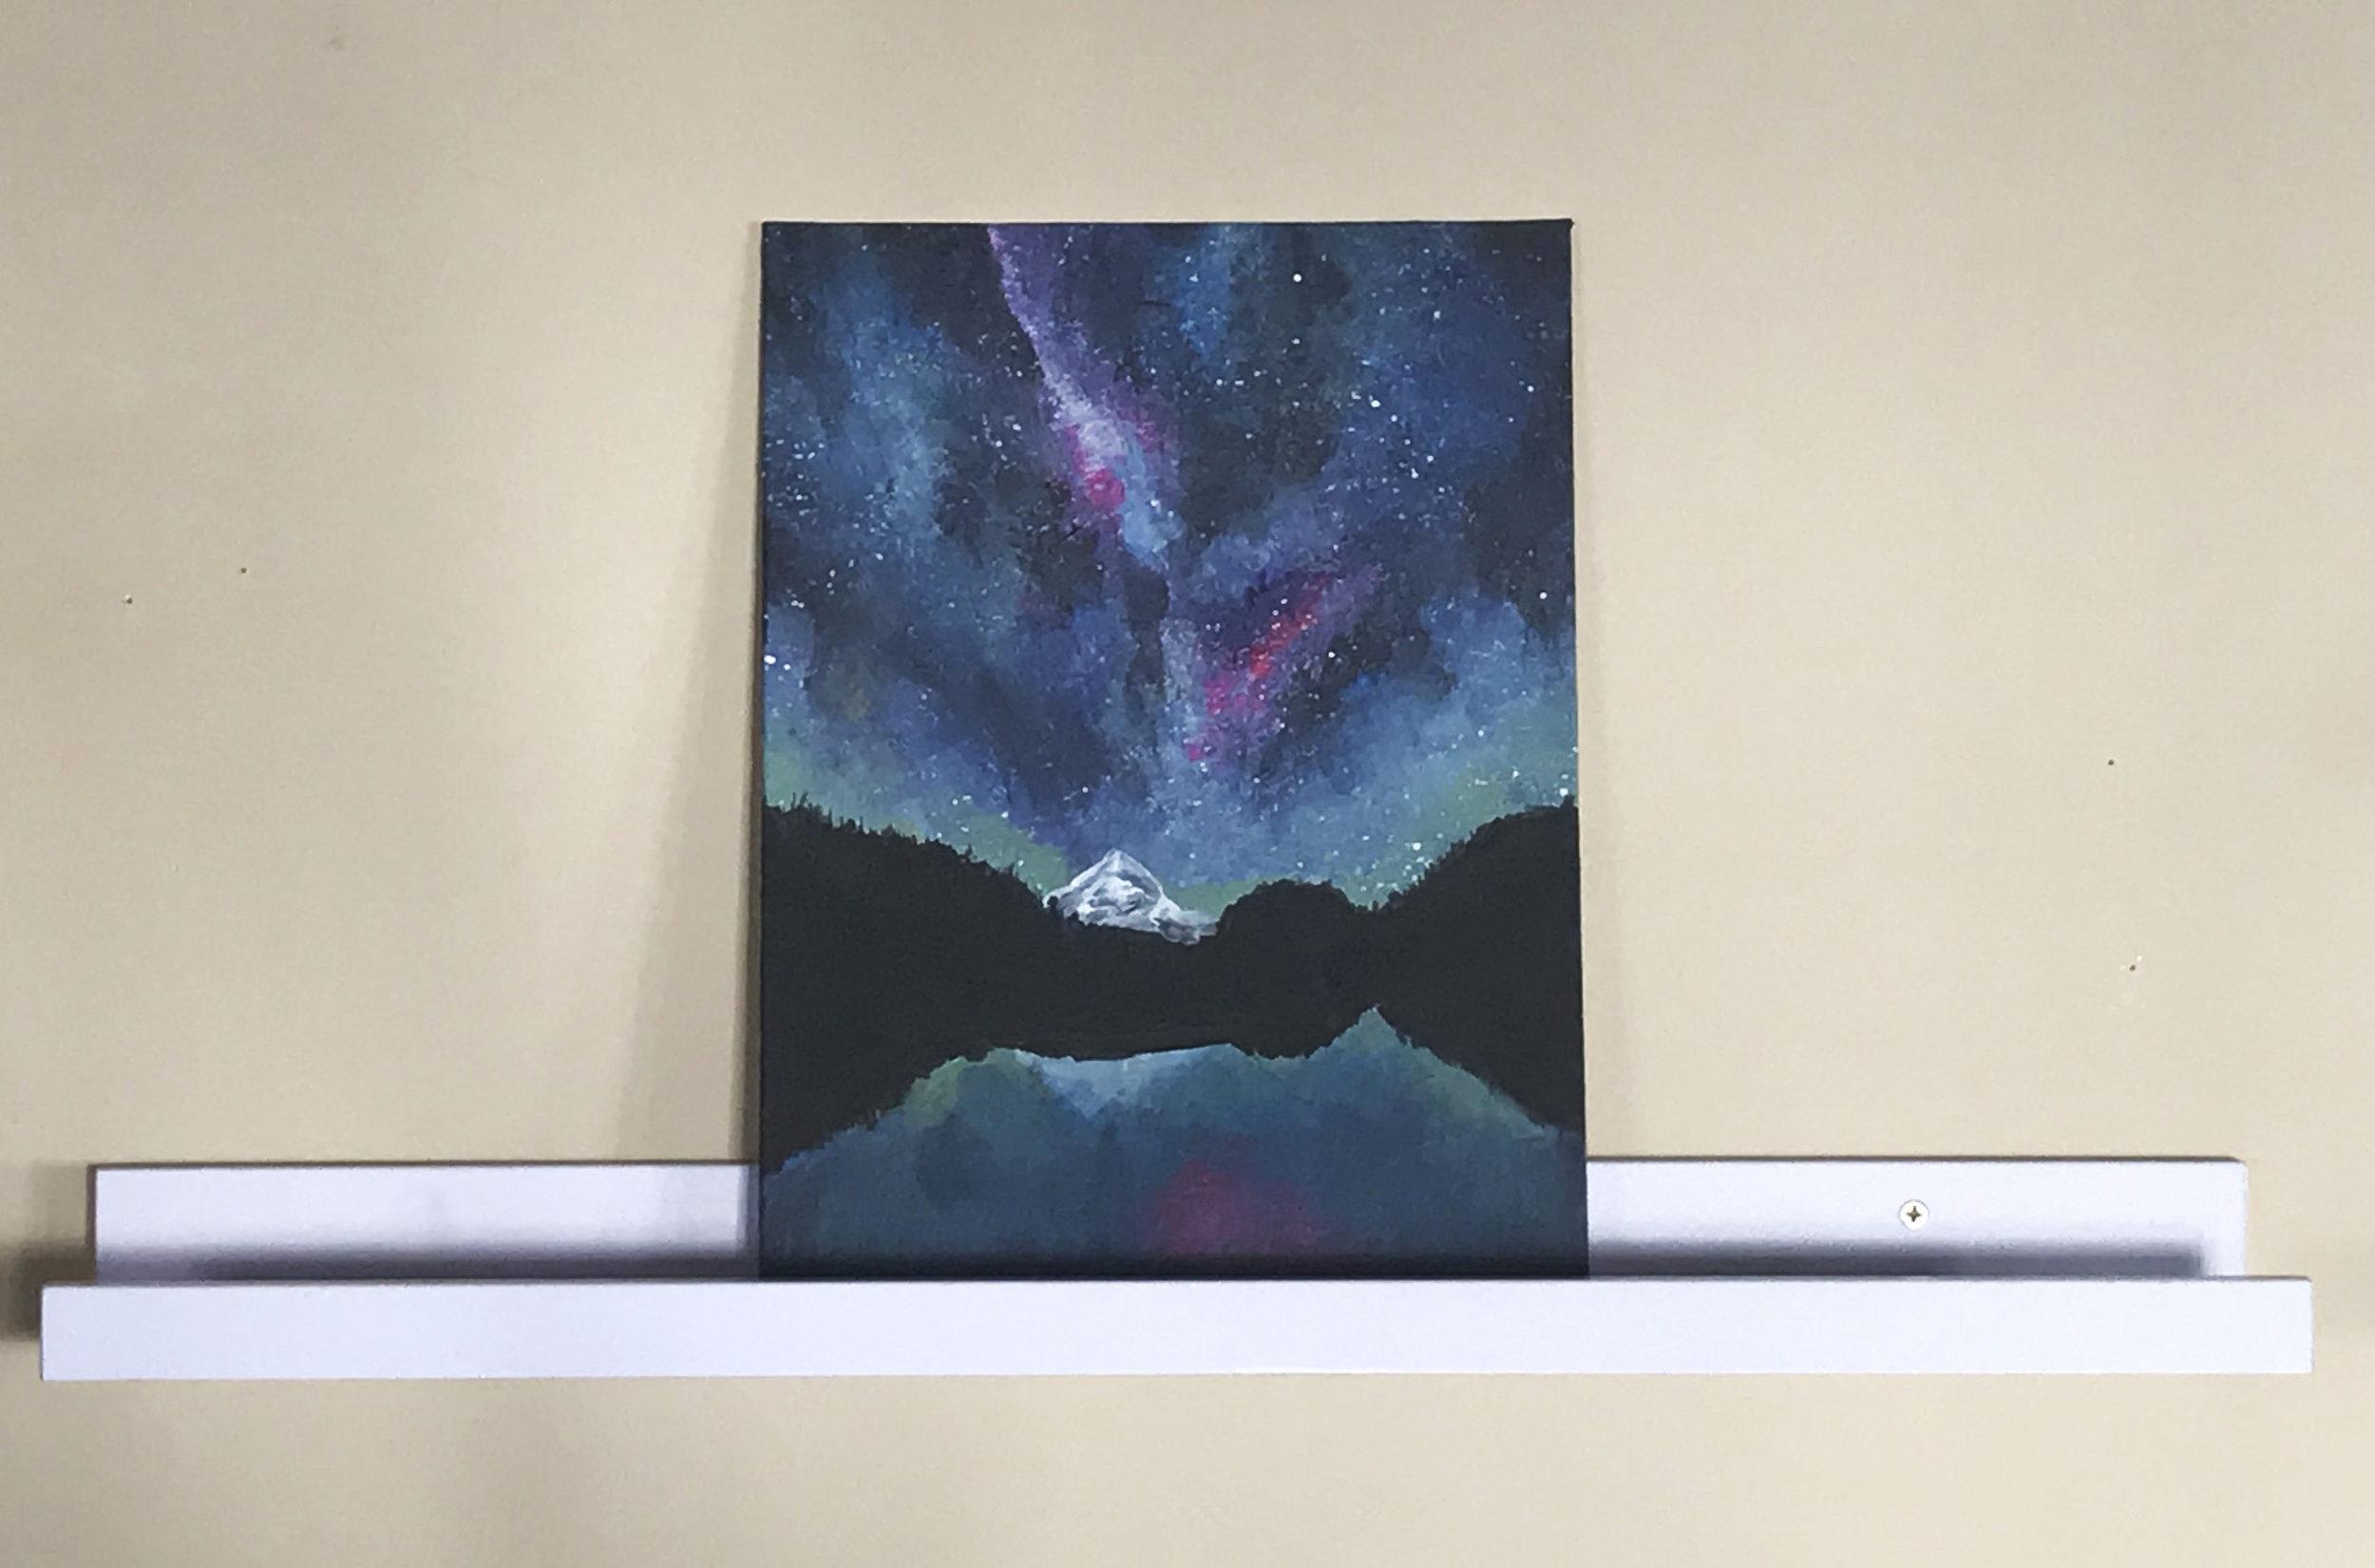 galaxy-painting.jpg